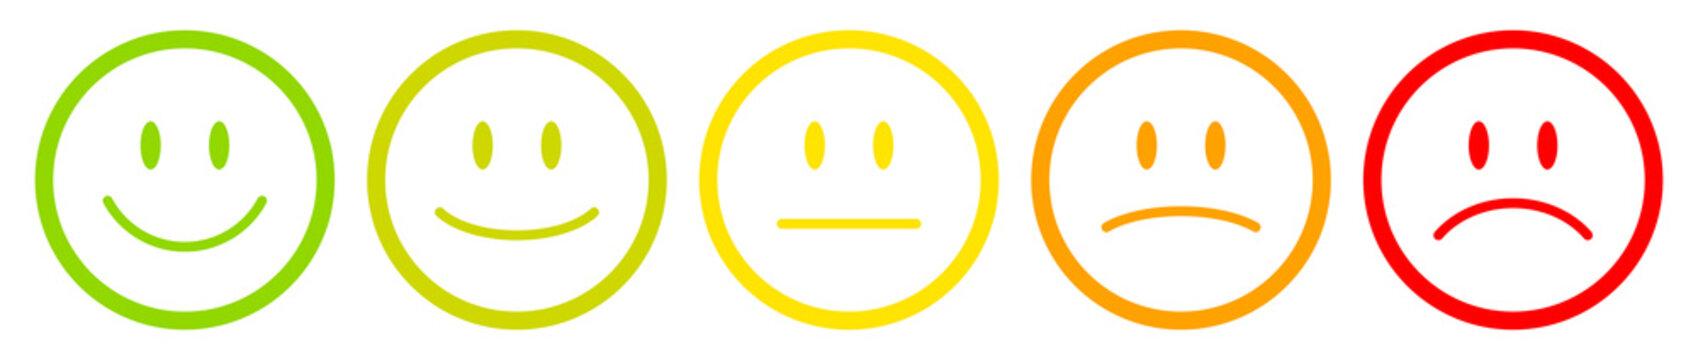 5 Color Faces Outline Feedback/Mood